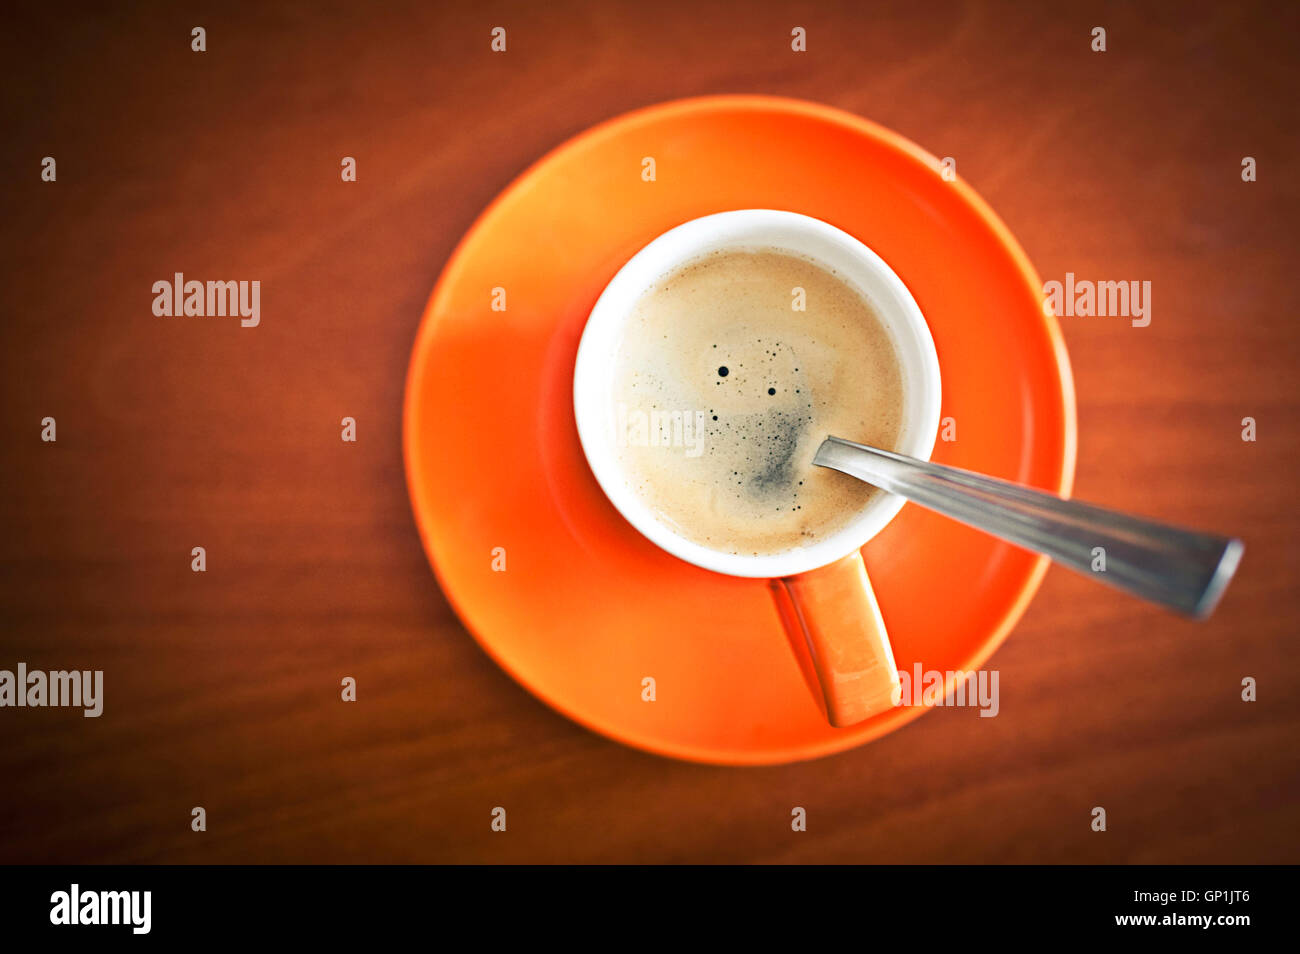 espresso coffee, top view - Stock Image